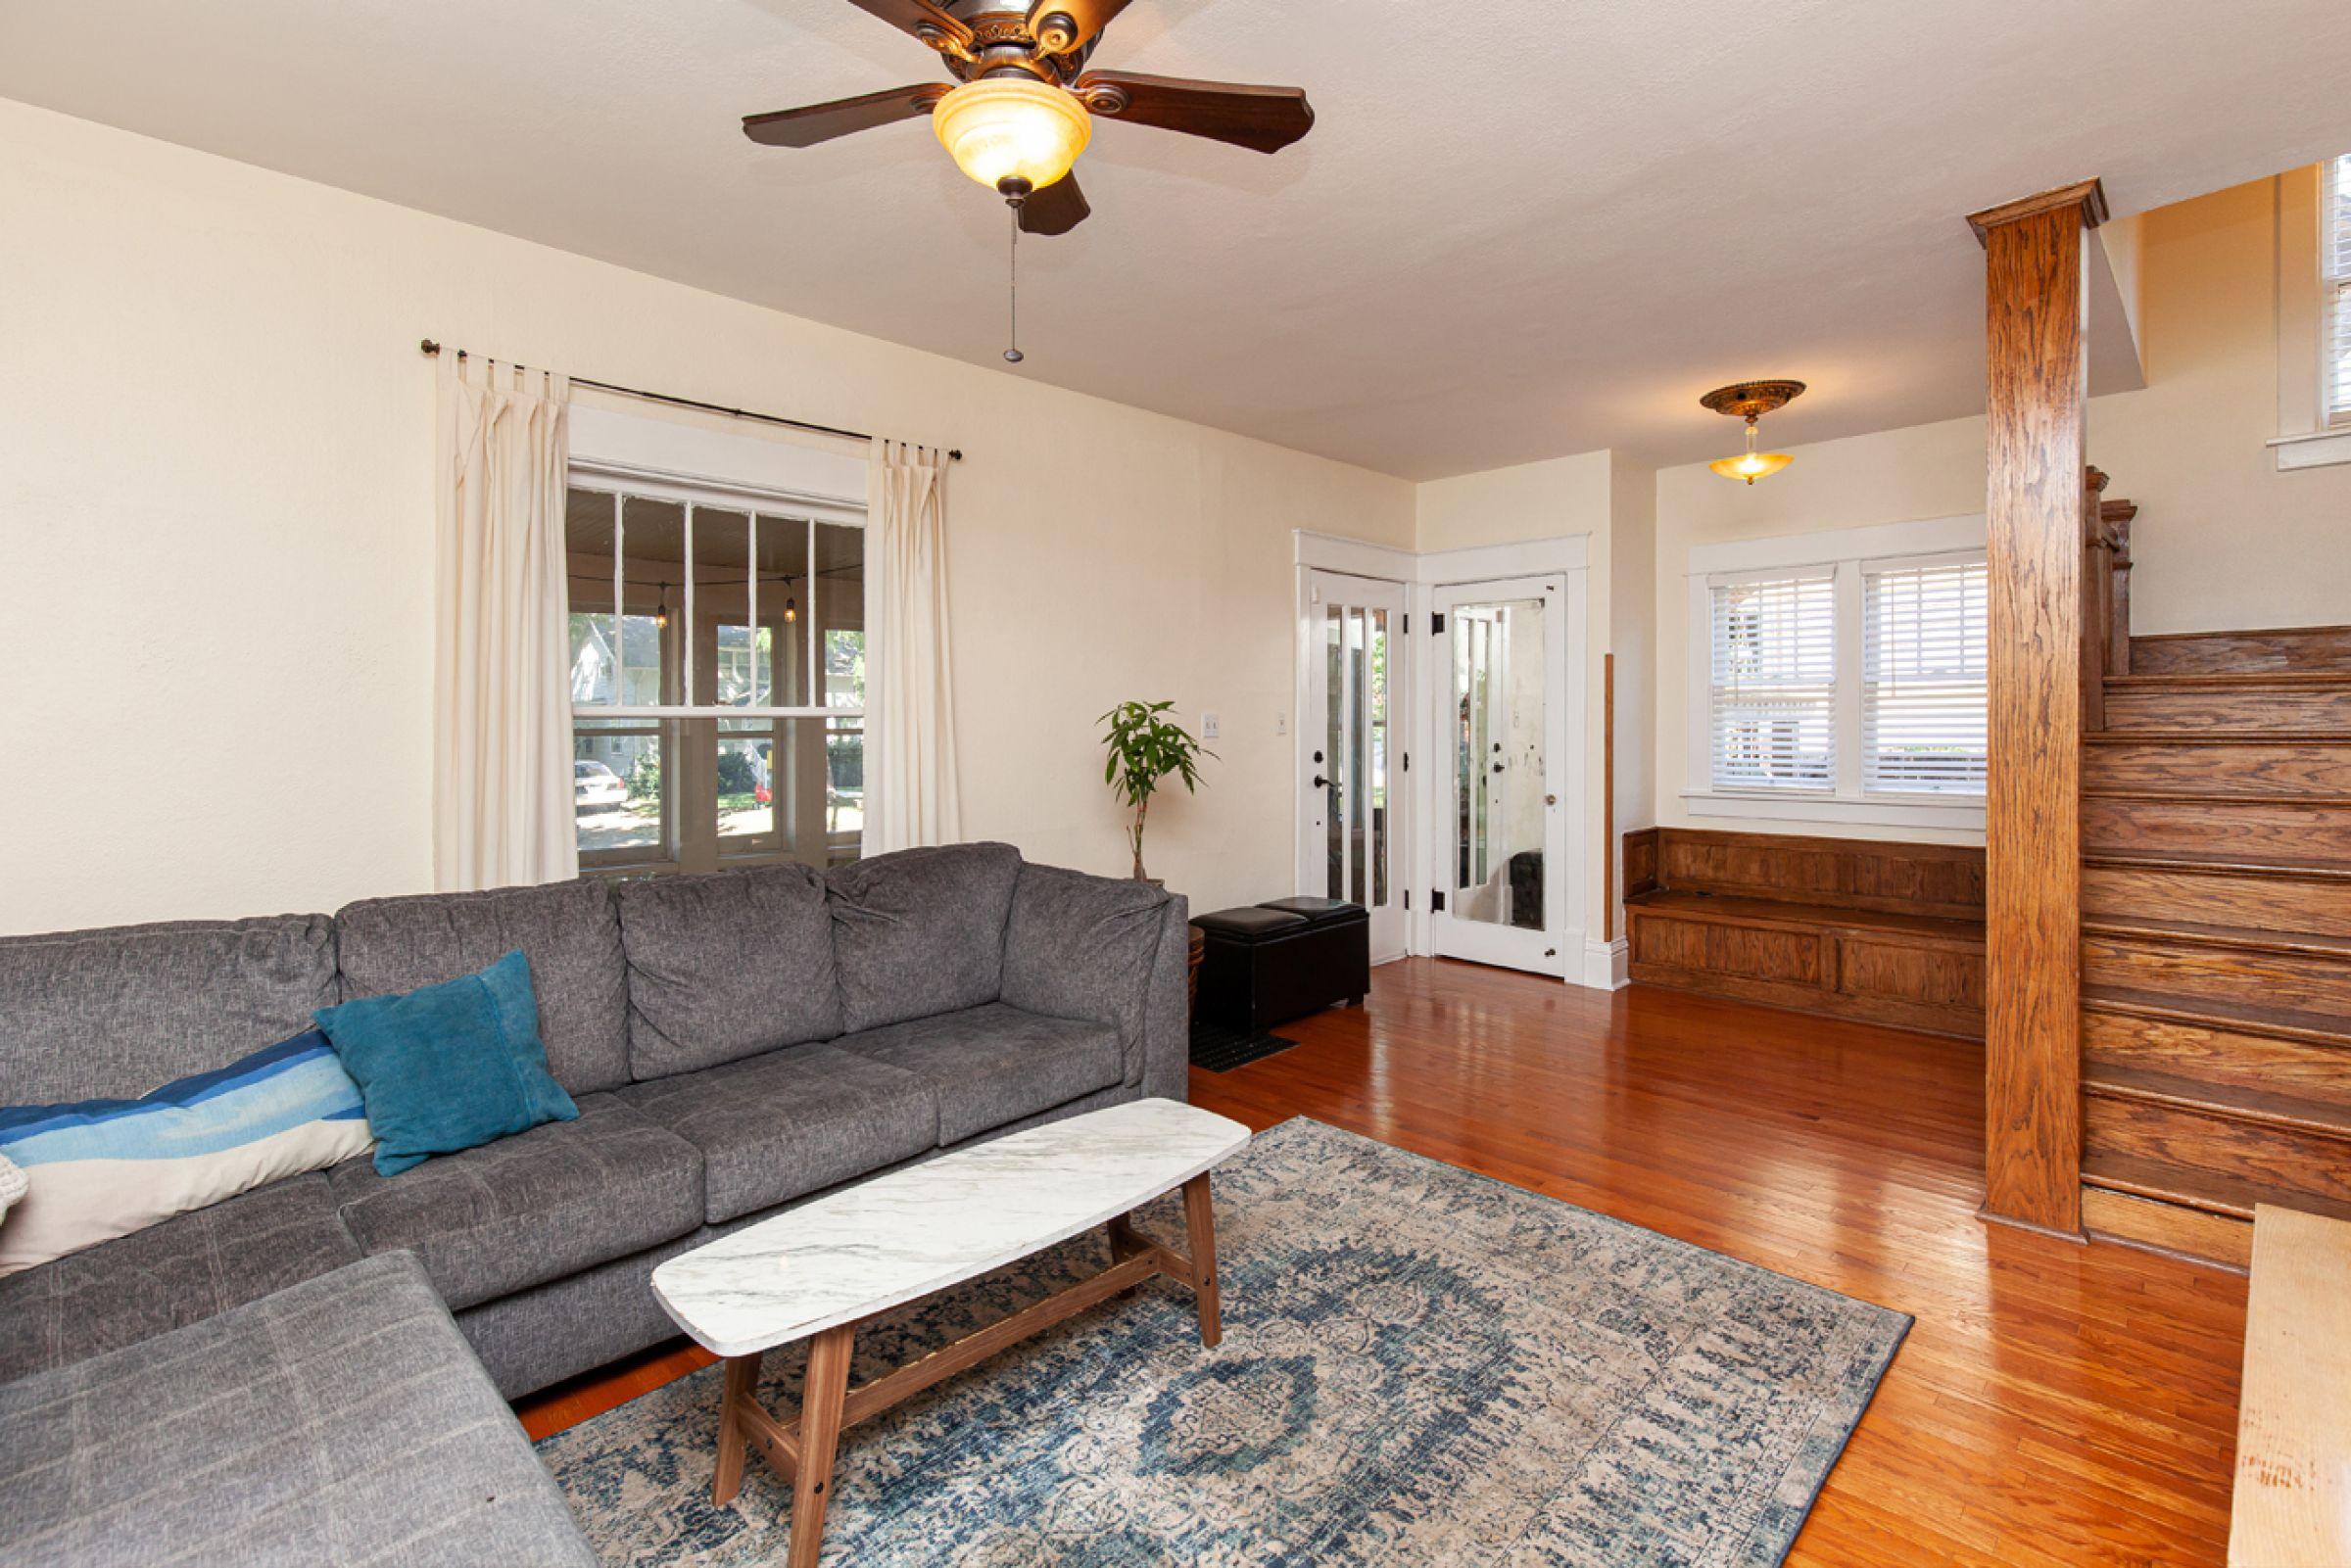 residential-polk-county-iowa-0-acres-listing-number-15153-0-2020-09-02-233542.jpg